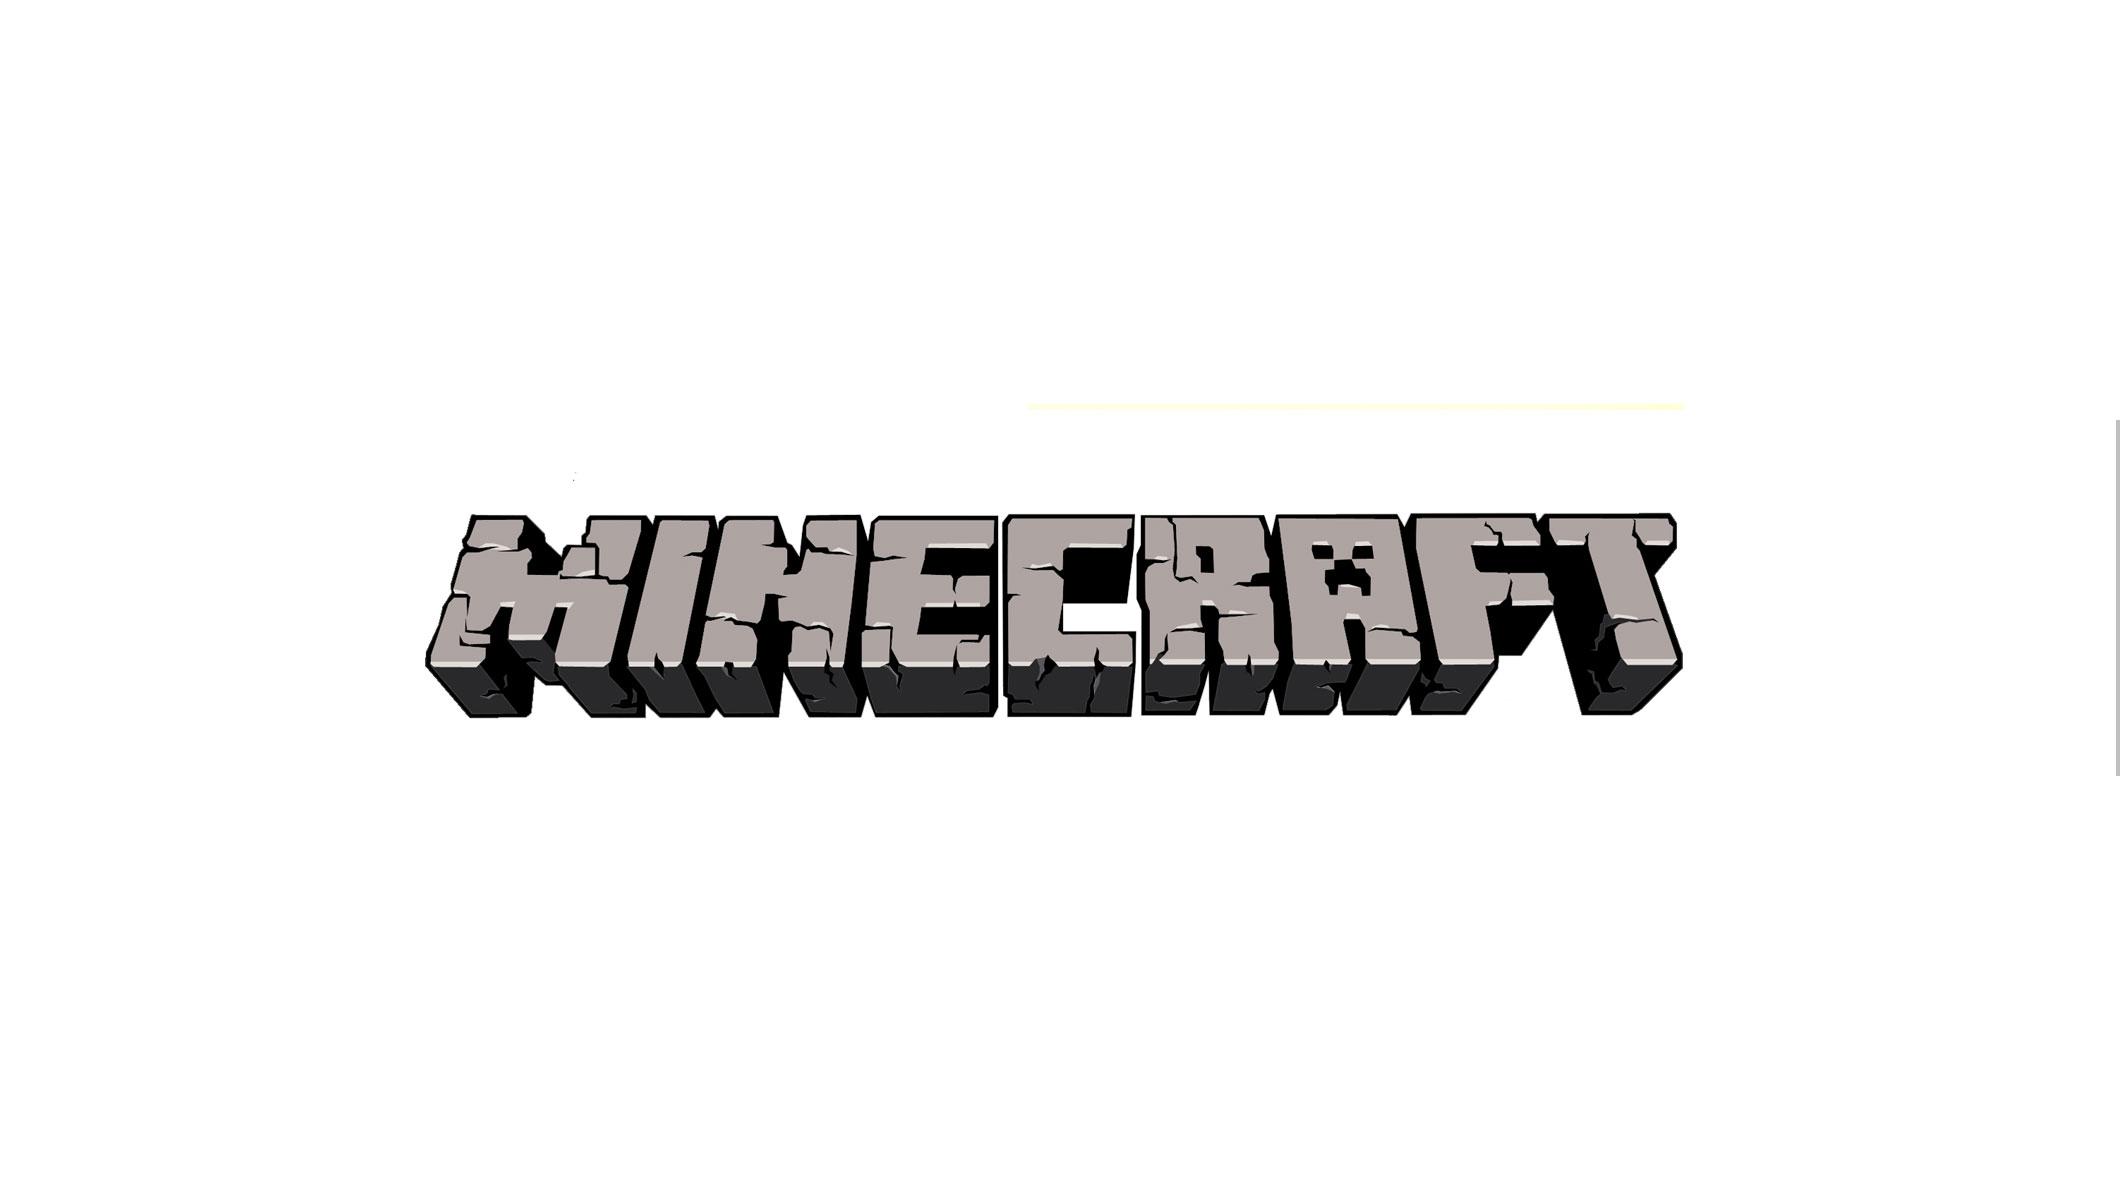 Minecraft Logo Channel Art Banner - YouTube Channel Art Banners